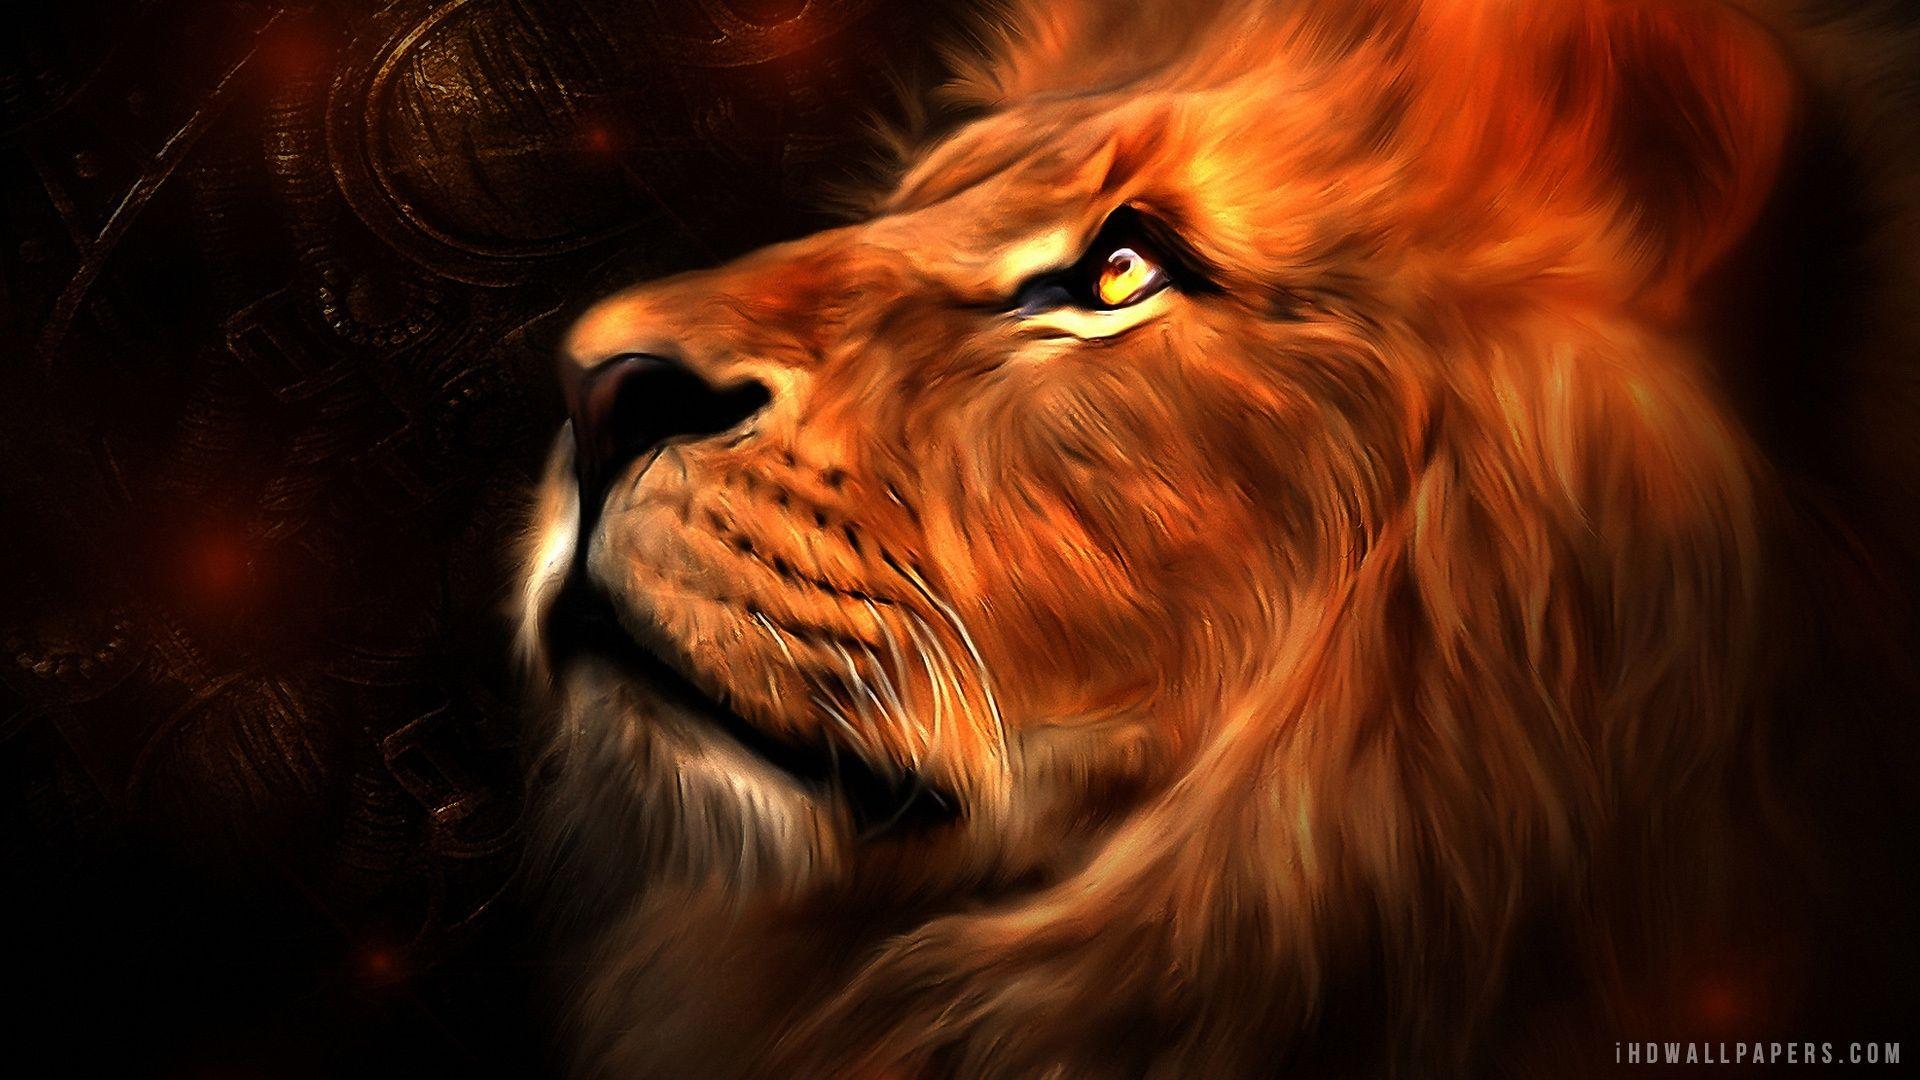 Lion Art Hd Wallpaper Ihd Wallpapers Lion Wallpaper Lion